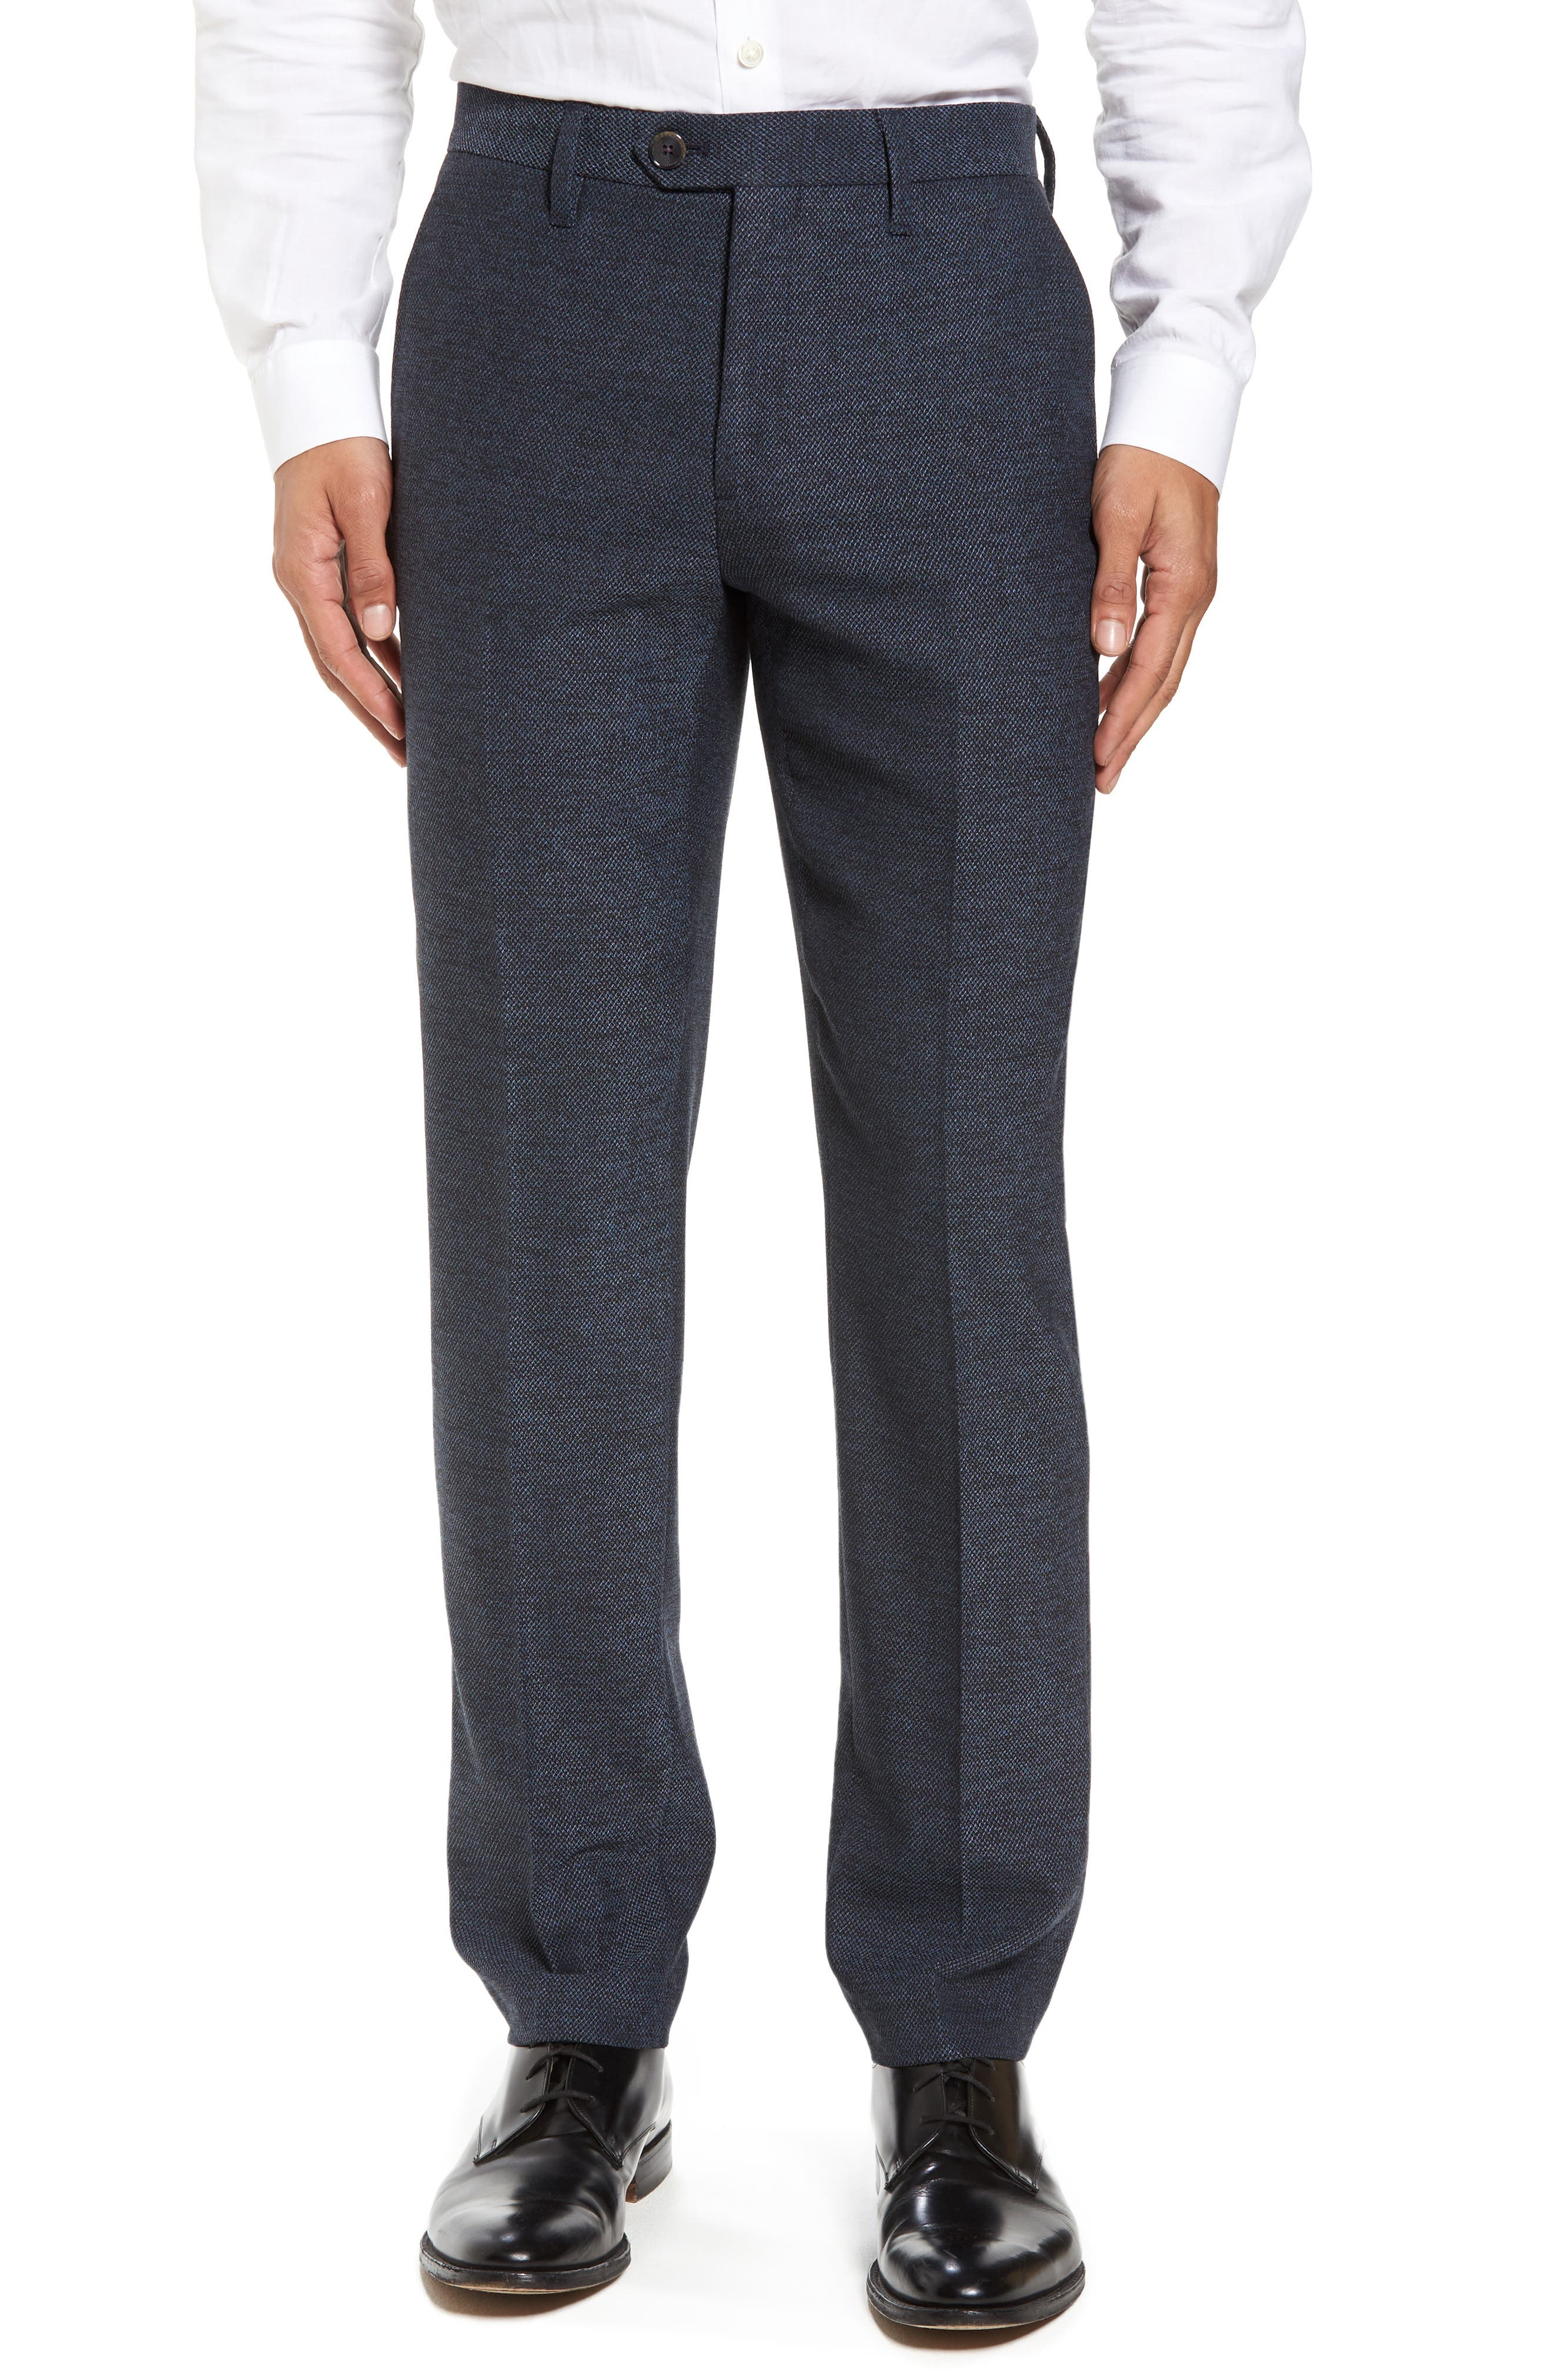 Alternate Image 1 Selected - Ted Baker London Porttro Modern Slim Fit Trousers